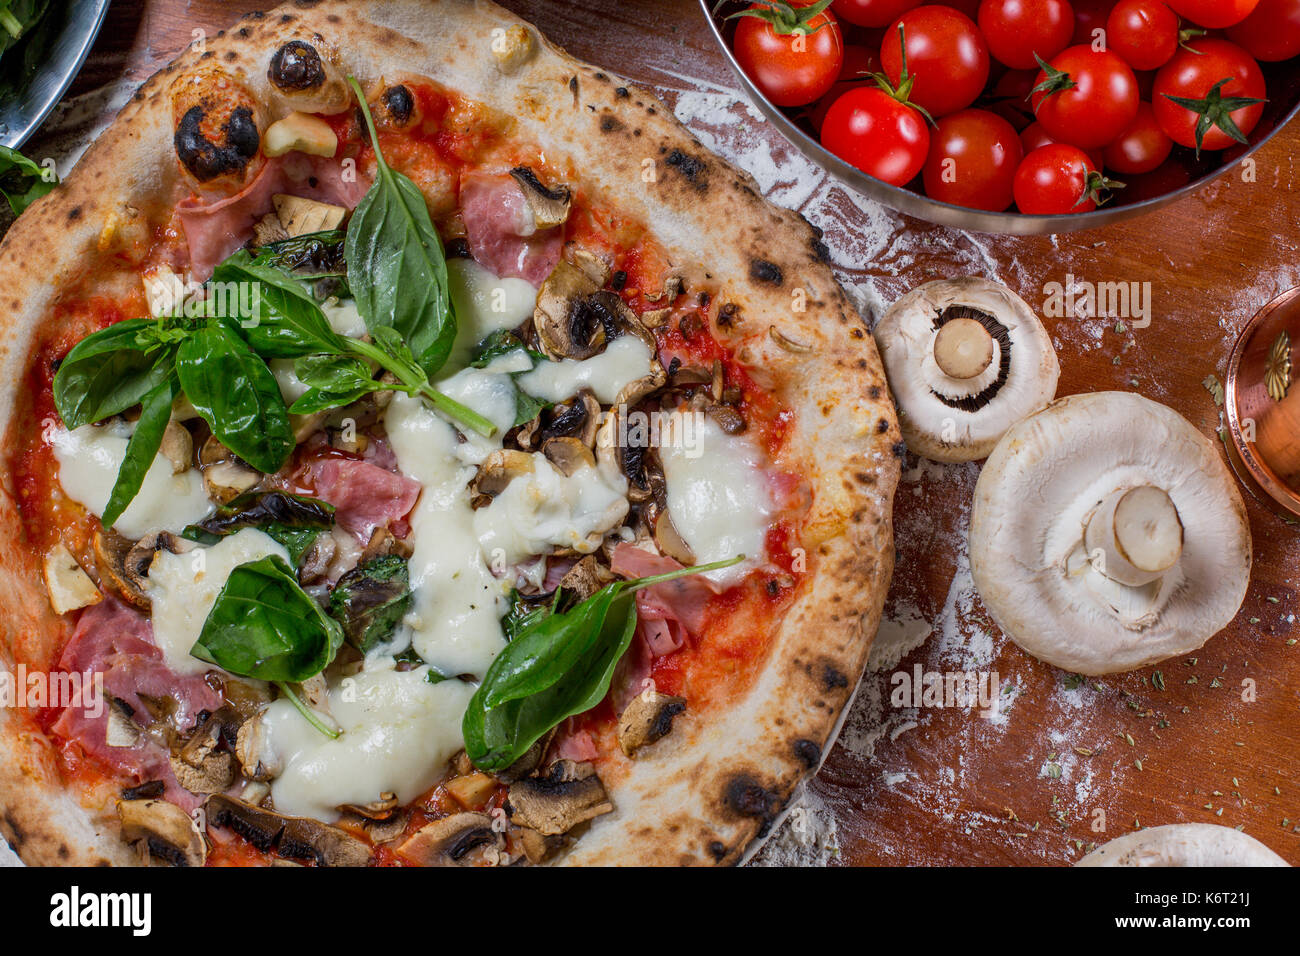 Pizza capricciosa with artichoke, ham and mushroom on wood background - Stock Image